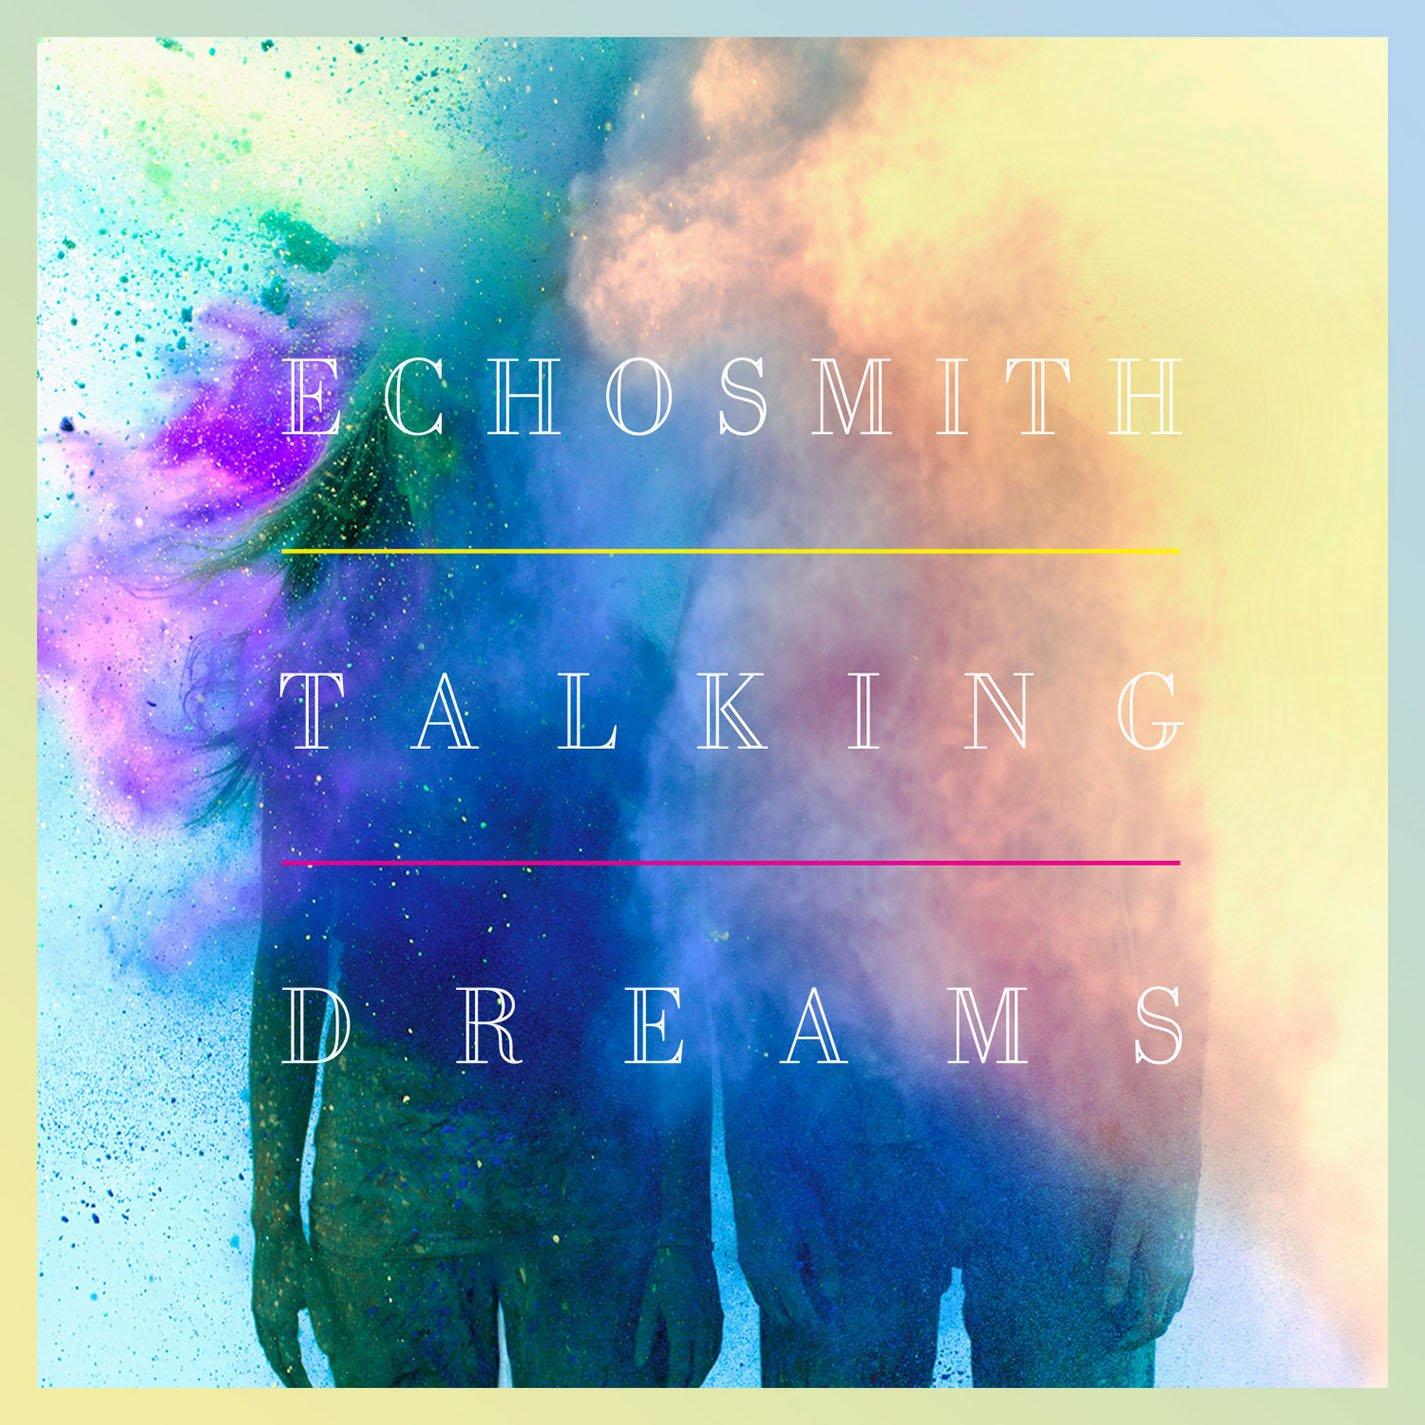 Talking Dreams [Analog]                                                                                                                                                                                                                                                    <span class=